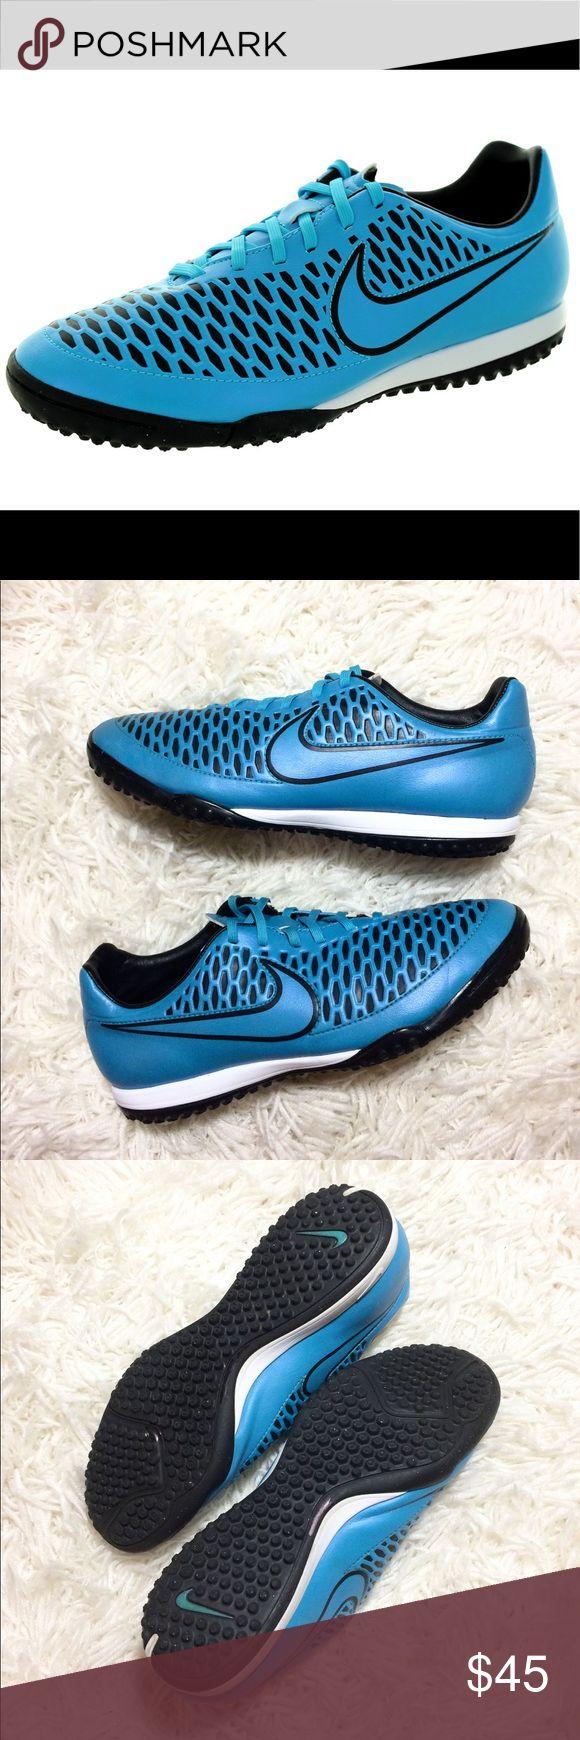 Spotted while shopping on Poshmark: Nike Magista Onda Astro Turf Soccer Shoes Size 7.5! #poshmark #fashion #shopping #style #Nike #Other